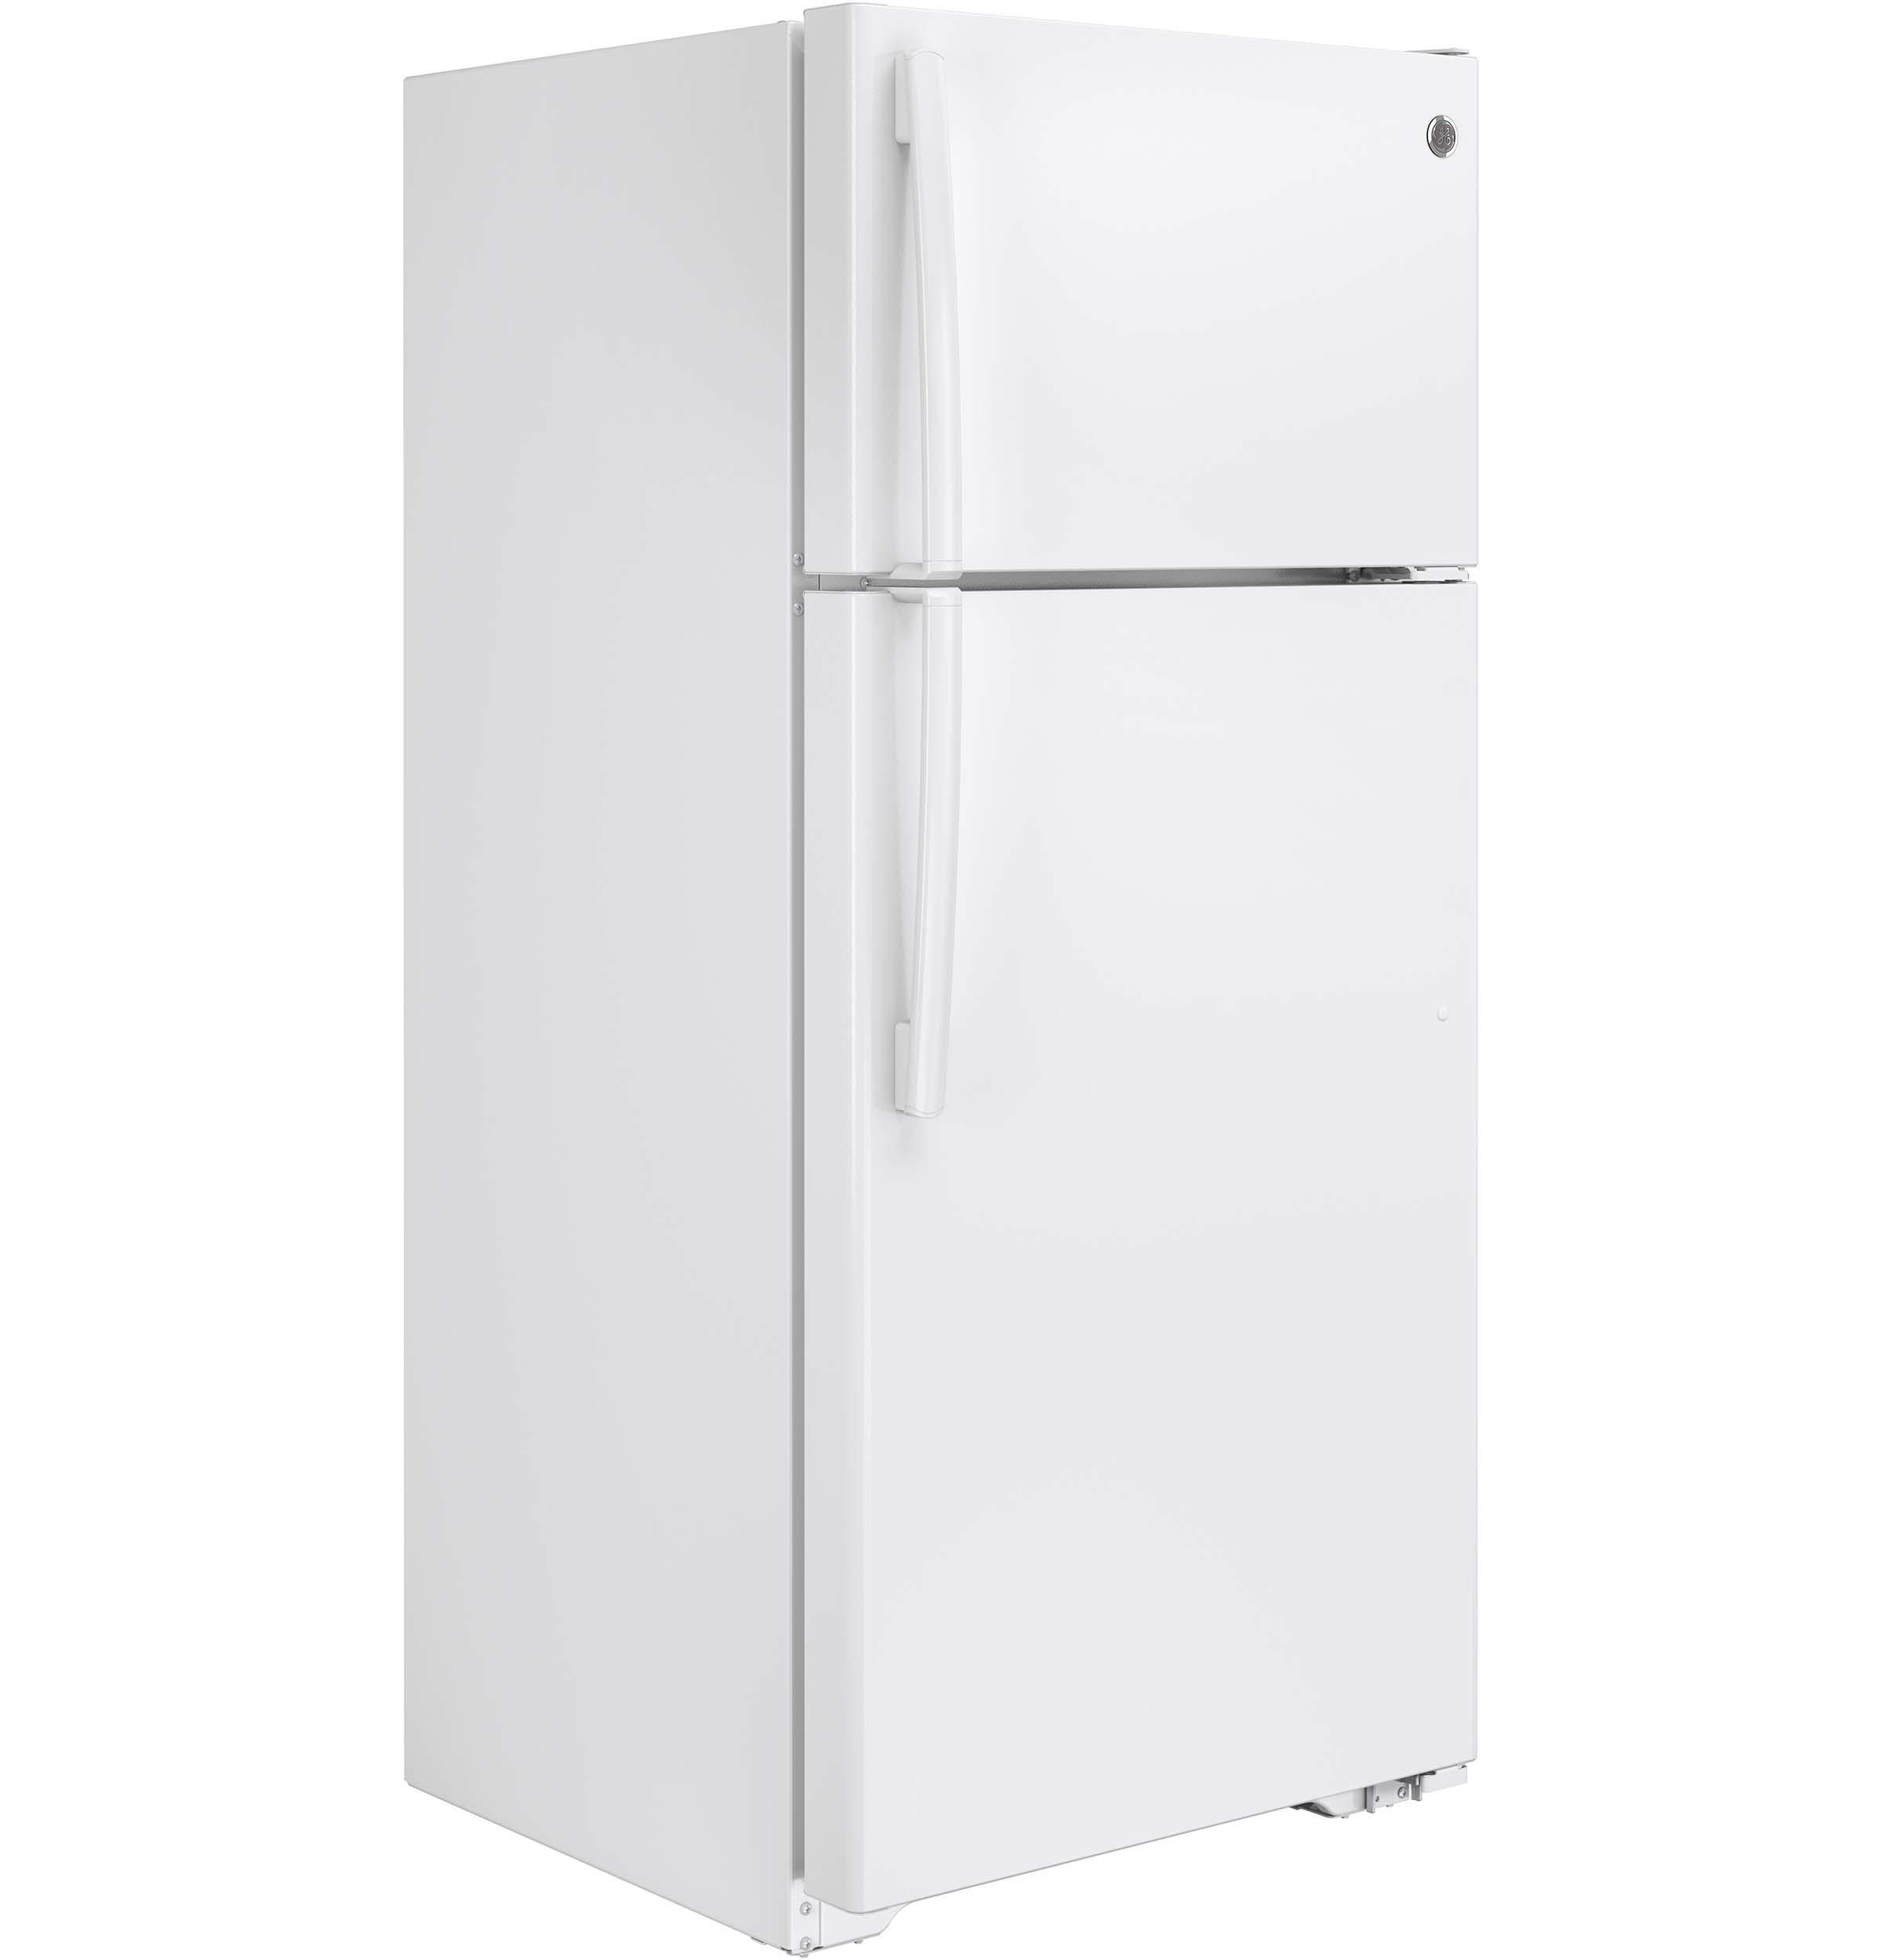 Gts16dth General Electric Gts16dth Top Freezer